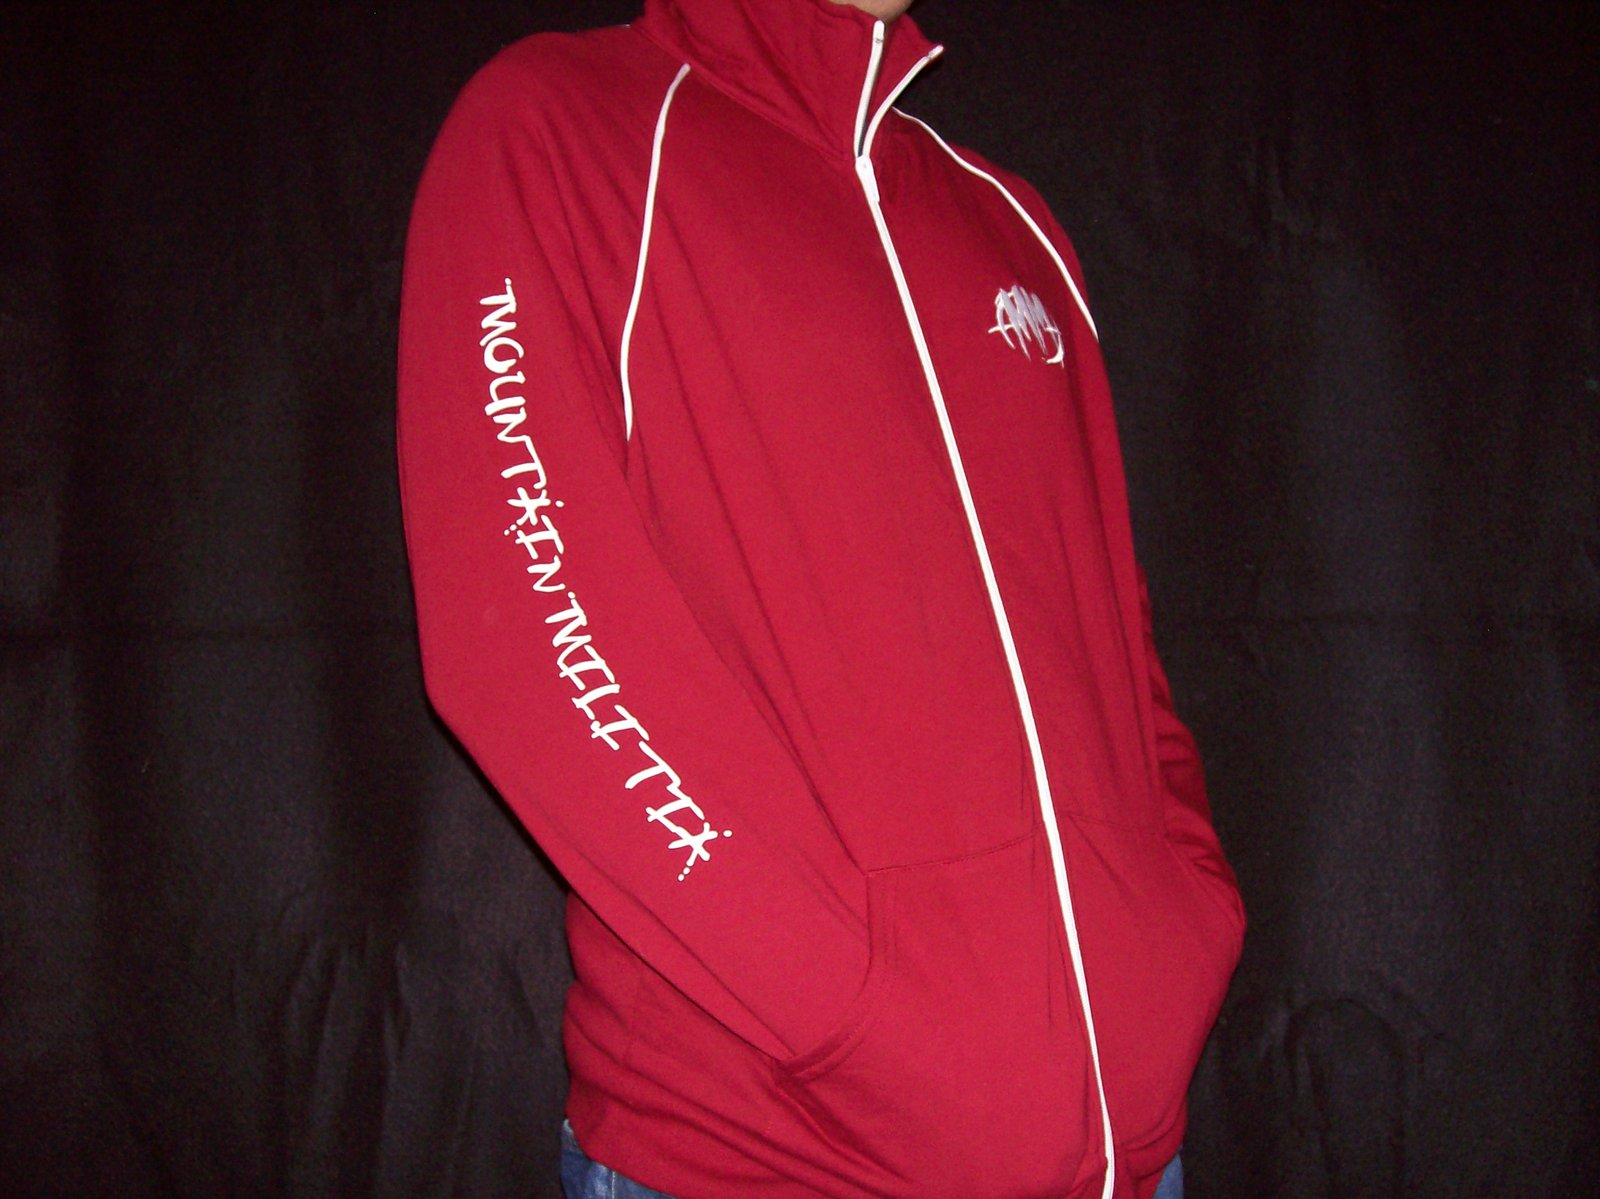 Mtn Milita Clothing - 16 of 16